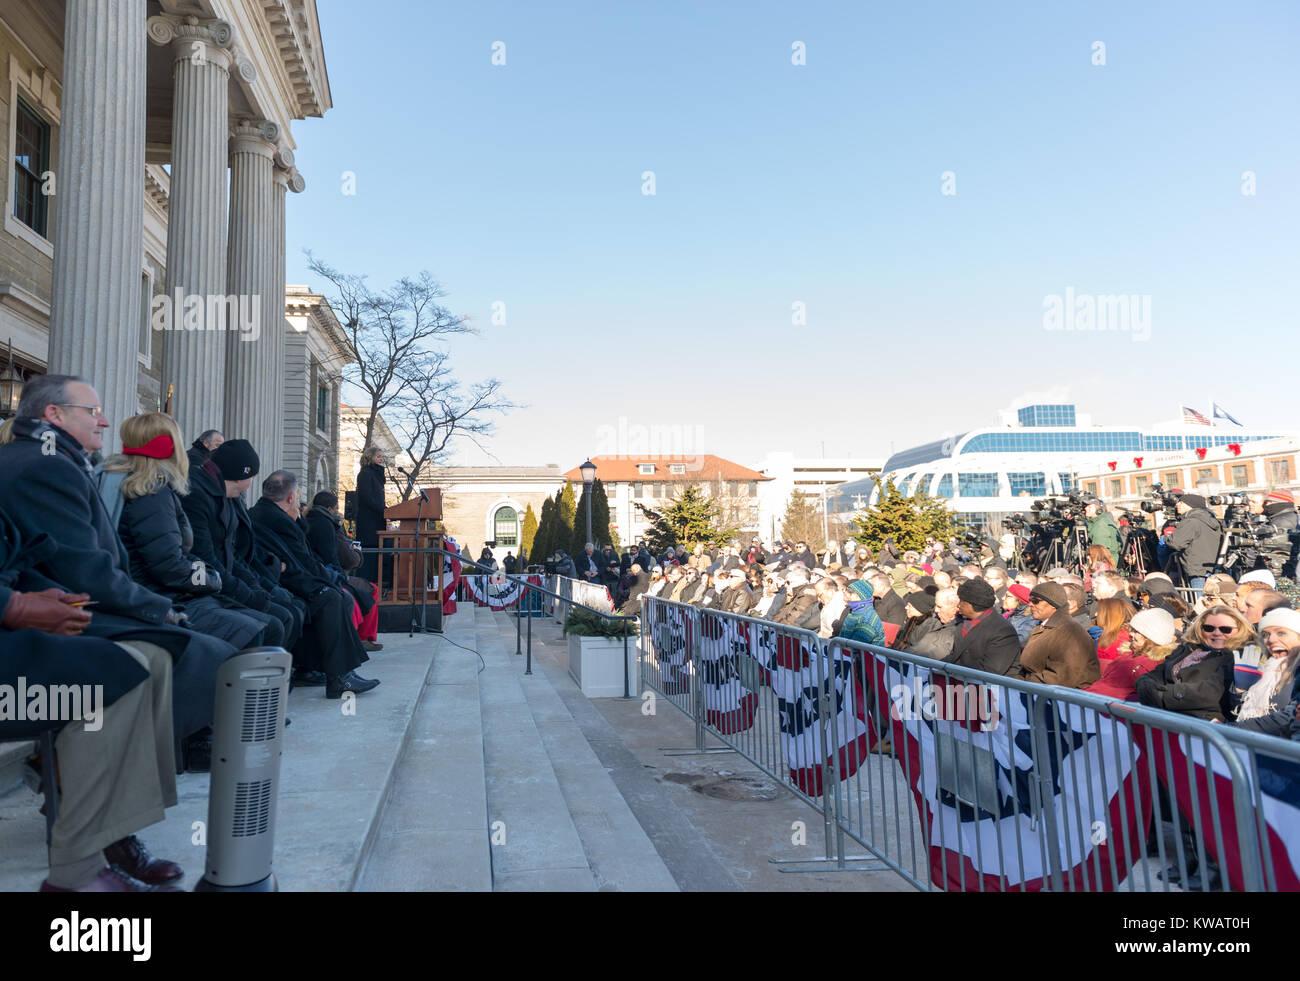 Mineola, New York, USA. 1st Jan, 2018. At podium, Nassau County Executive LAURA CURRAN, who has just be sworn in - Stock Image